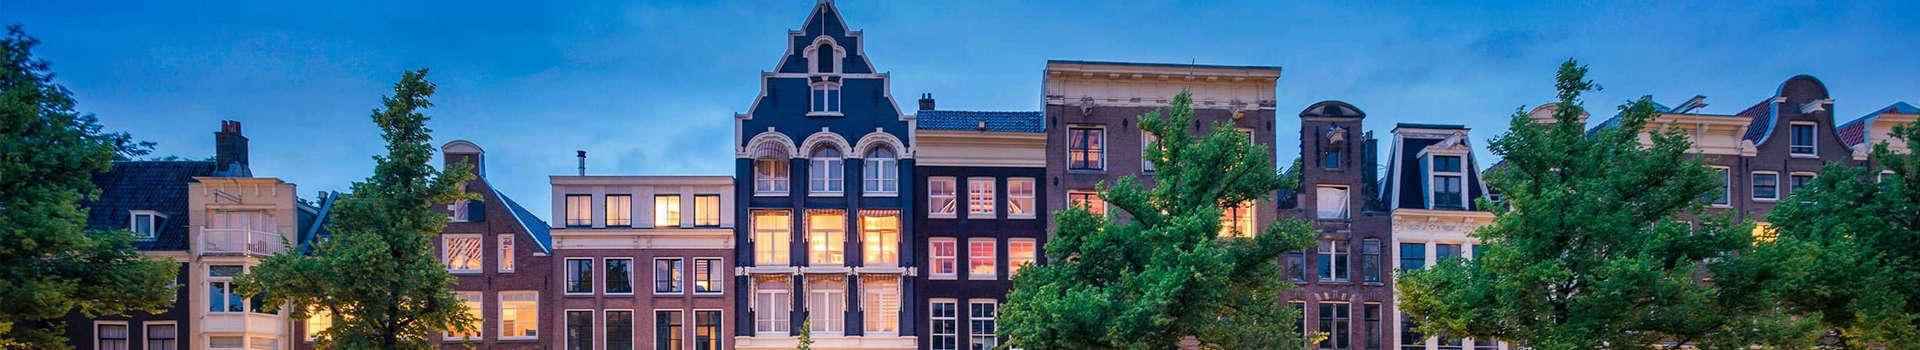 Amsterdam-the-netherlands